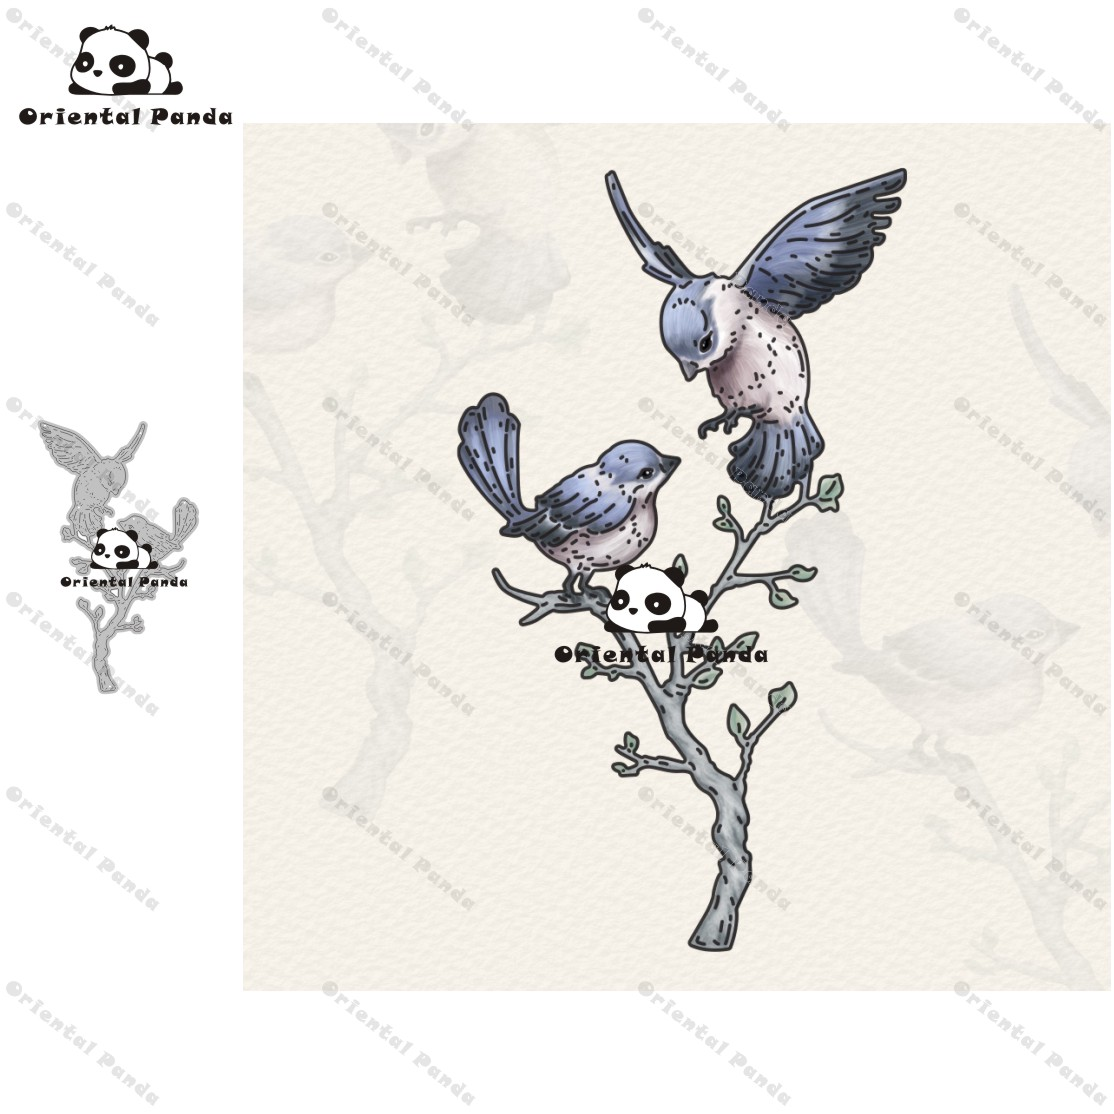 New Dies 2020 Little Bird Metal Cutting Dies Diy Dies Photo Album  Cutting Dies Scrapbooking Stencil Die Cuts Card Making